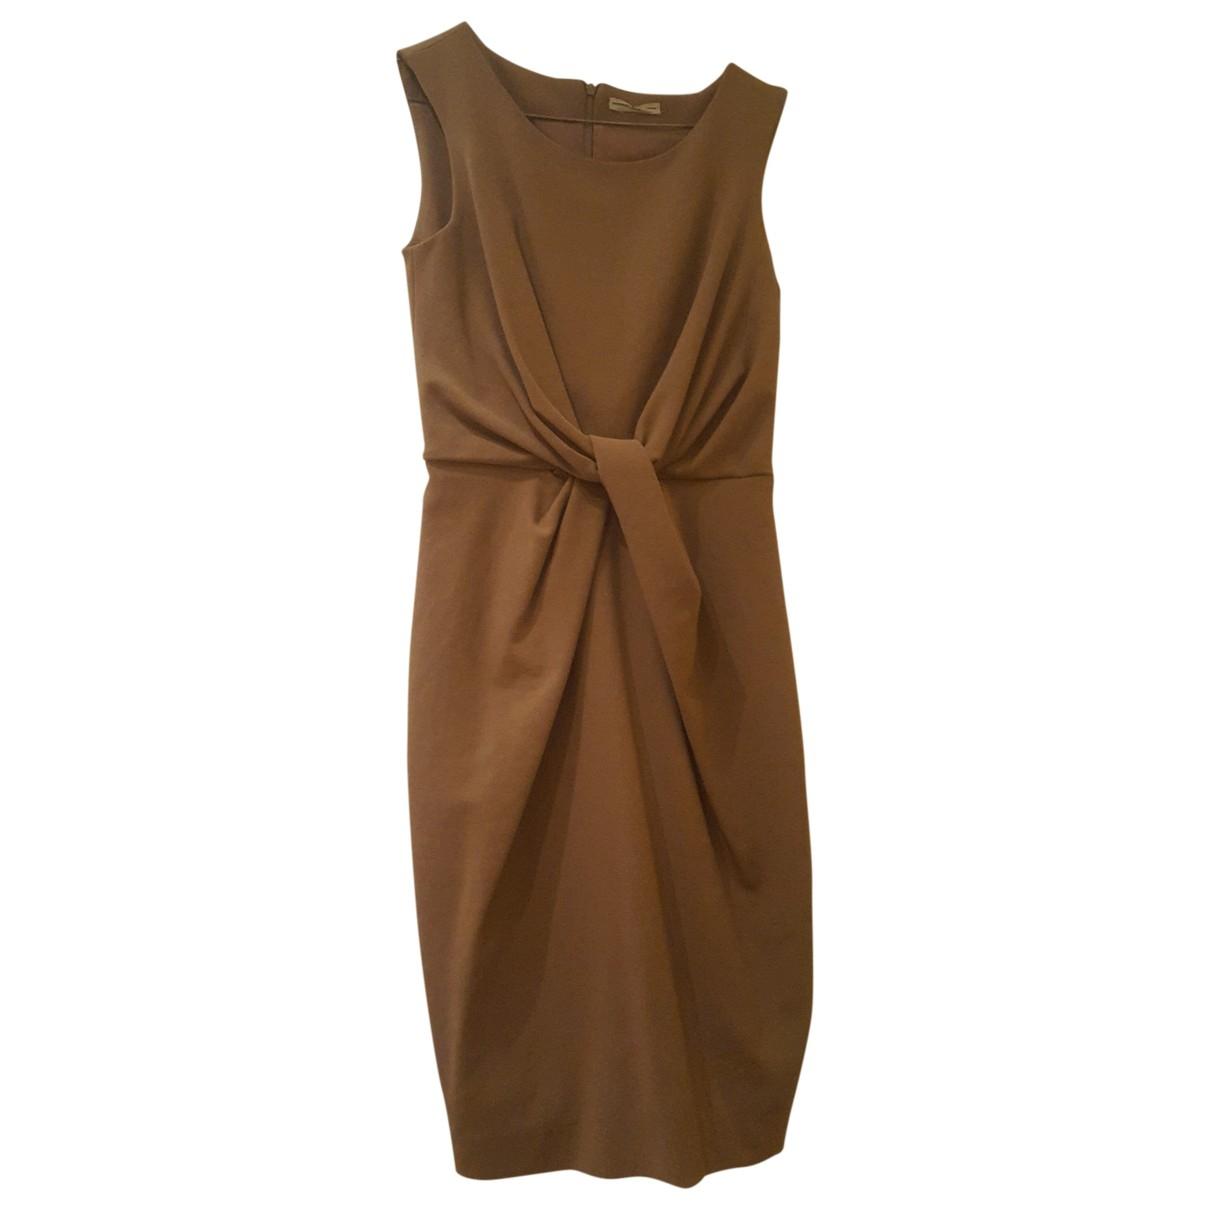 Daniele Alessandrini \N Kleid in  Beige Polyester